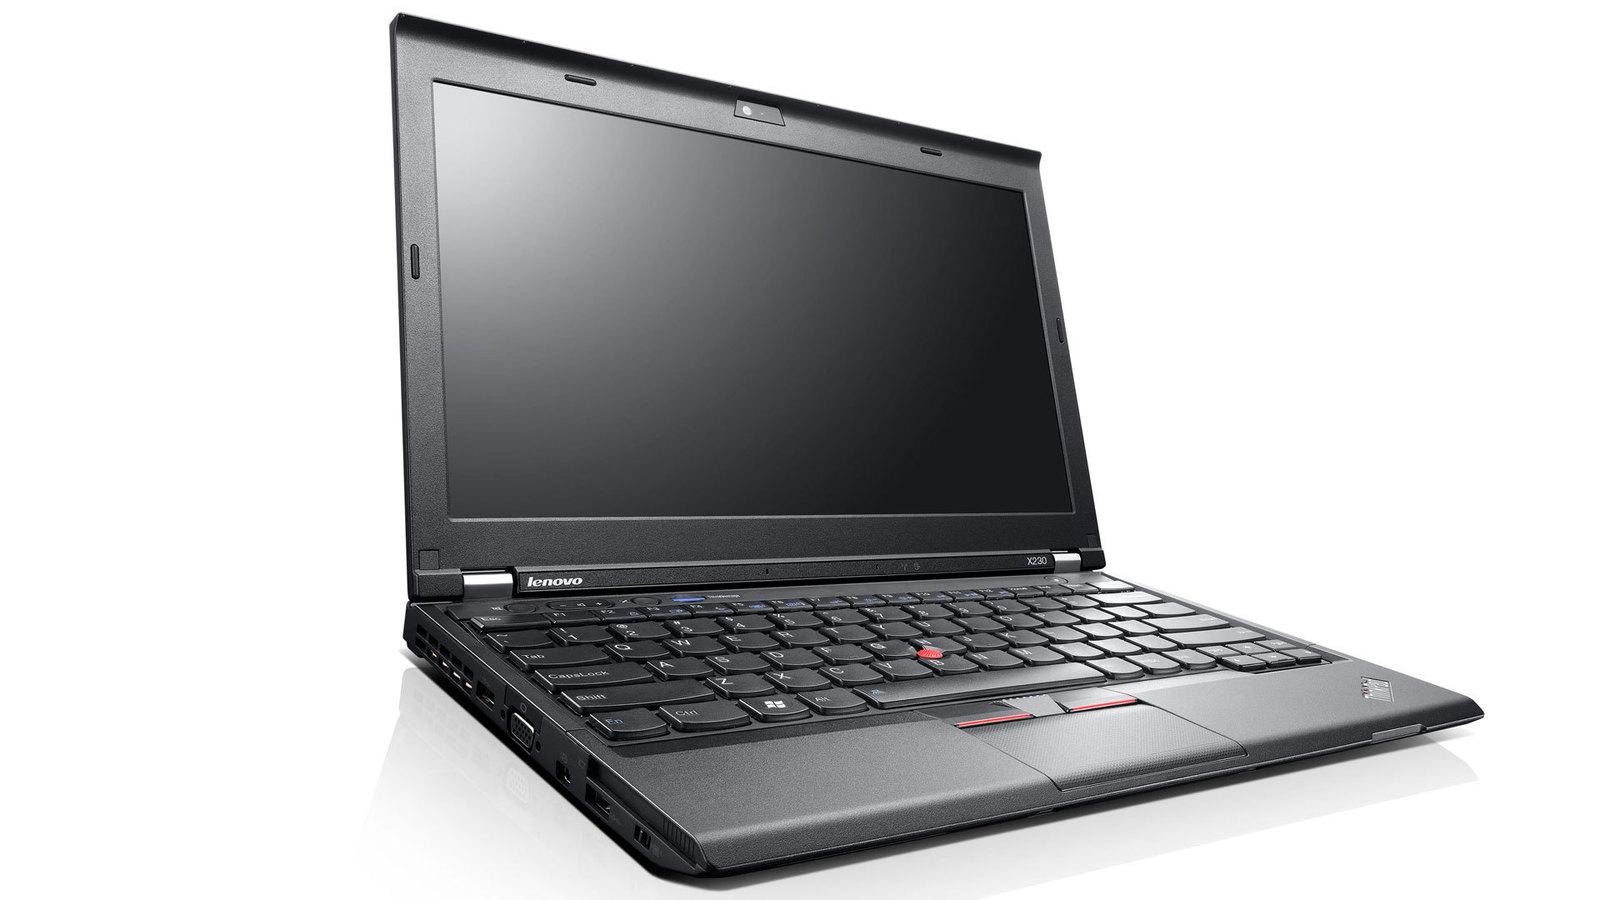 Lenovo Thinkpad X230 I3 3120m 4gb 320gb Skroutz Gr